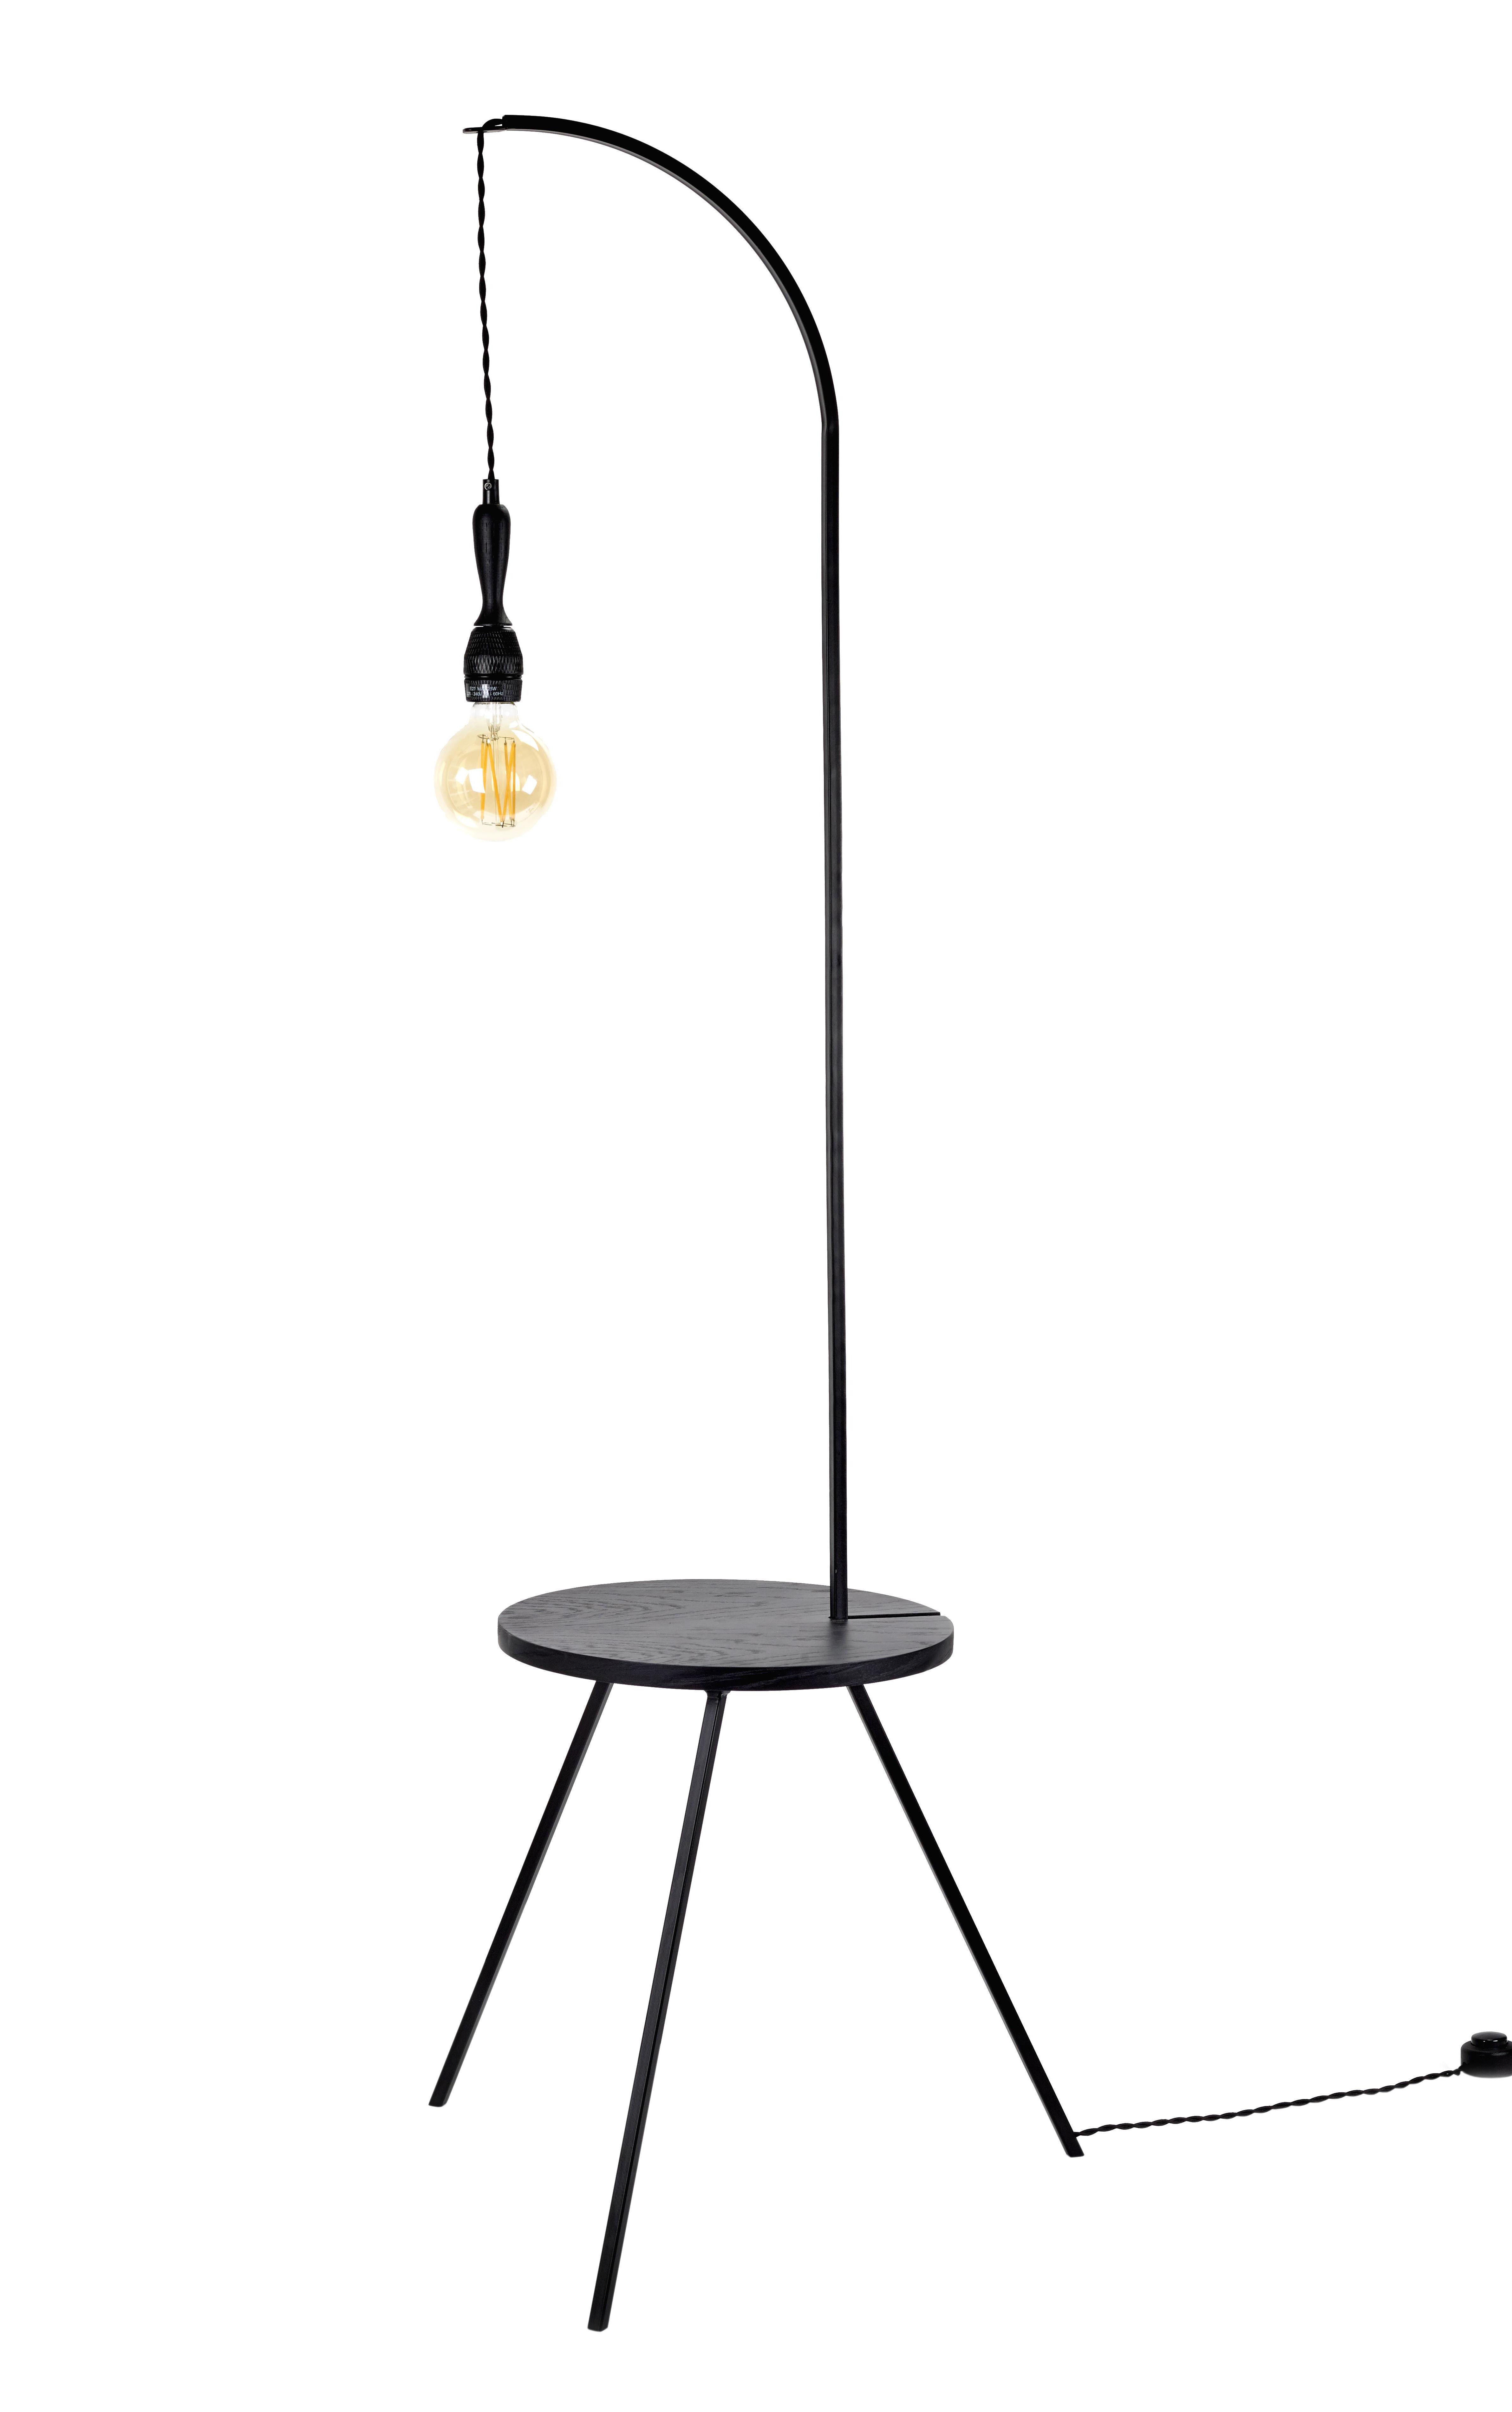 Furniture - Coffee Tables - Studio Simple Illuminated side table - / Ø 50 x H 160 cm by Serax - Noir - Bois plaqué, Metal